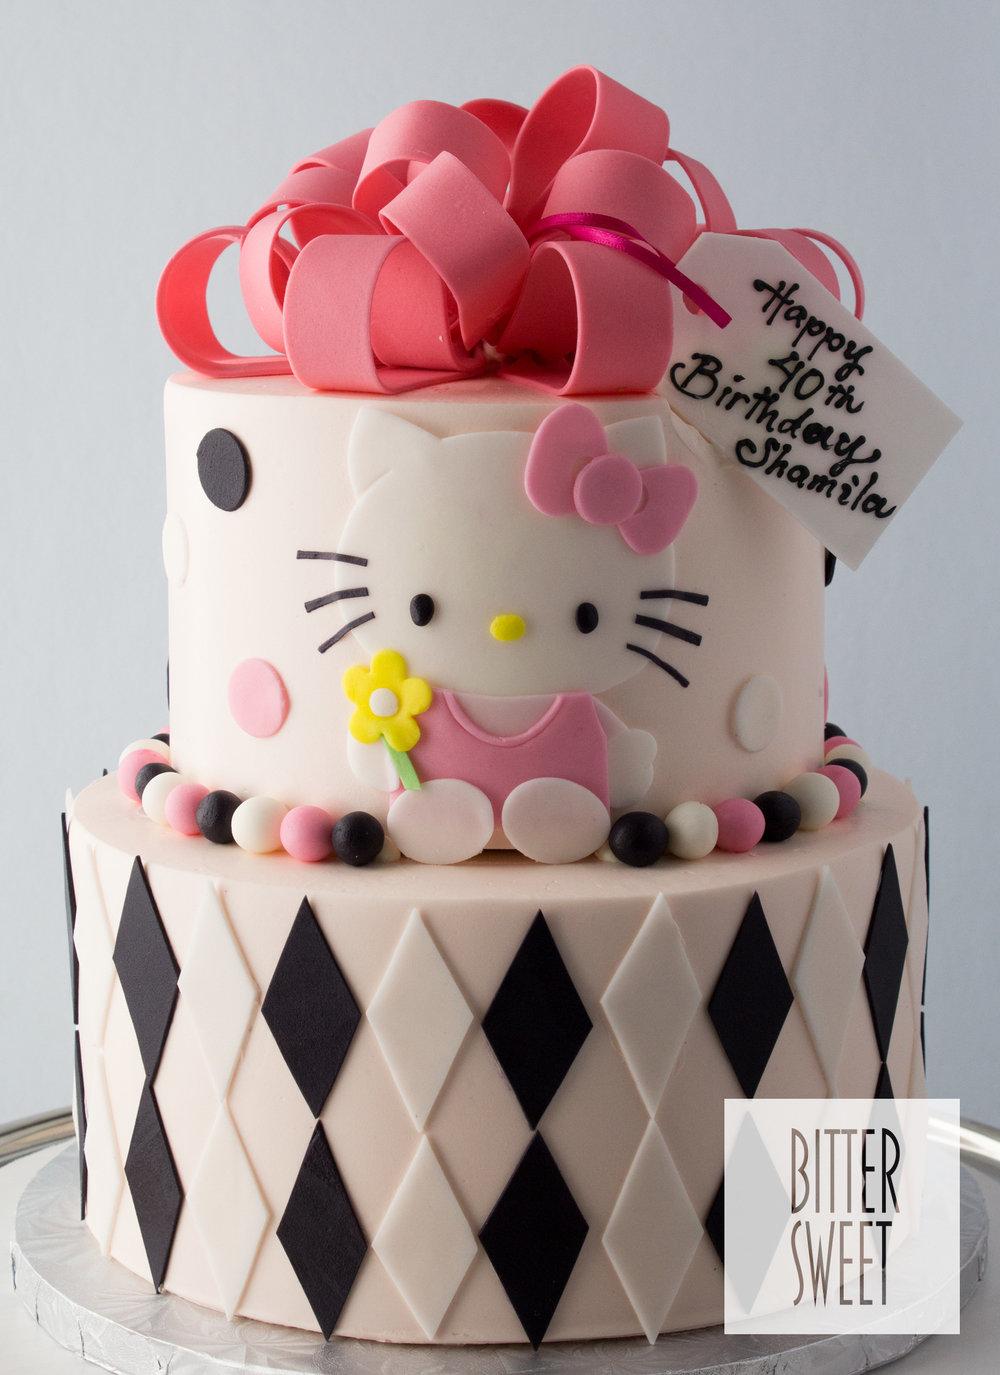 Bittersweet Birthday_Hello Kitty.jpg